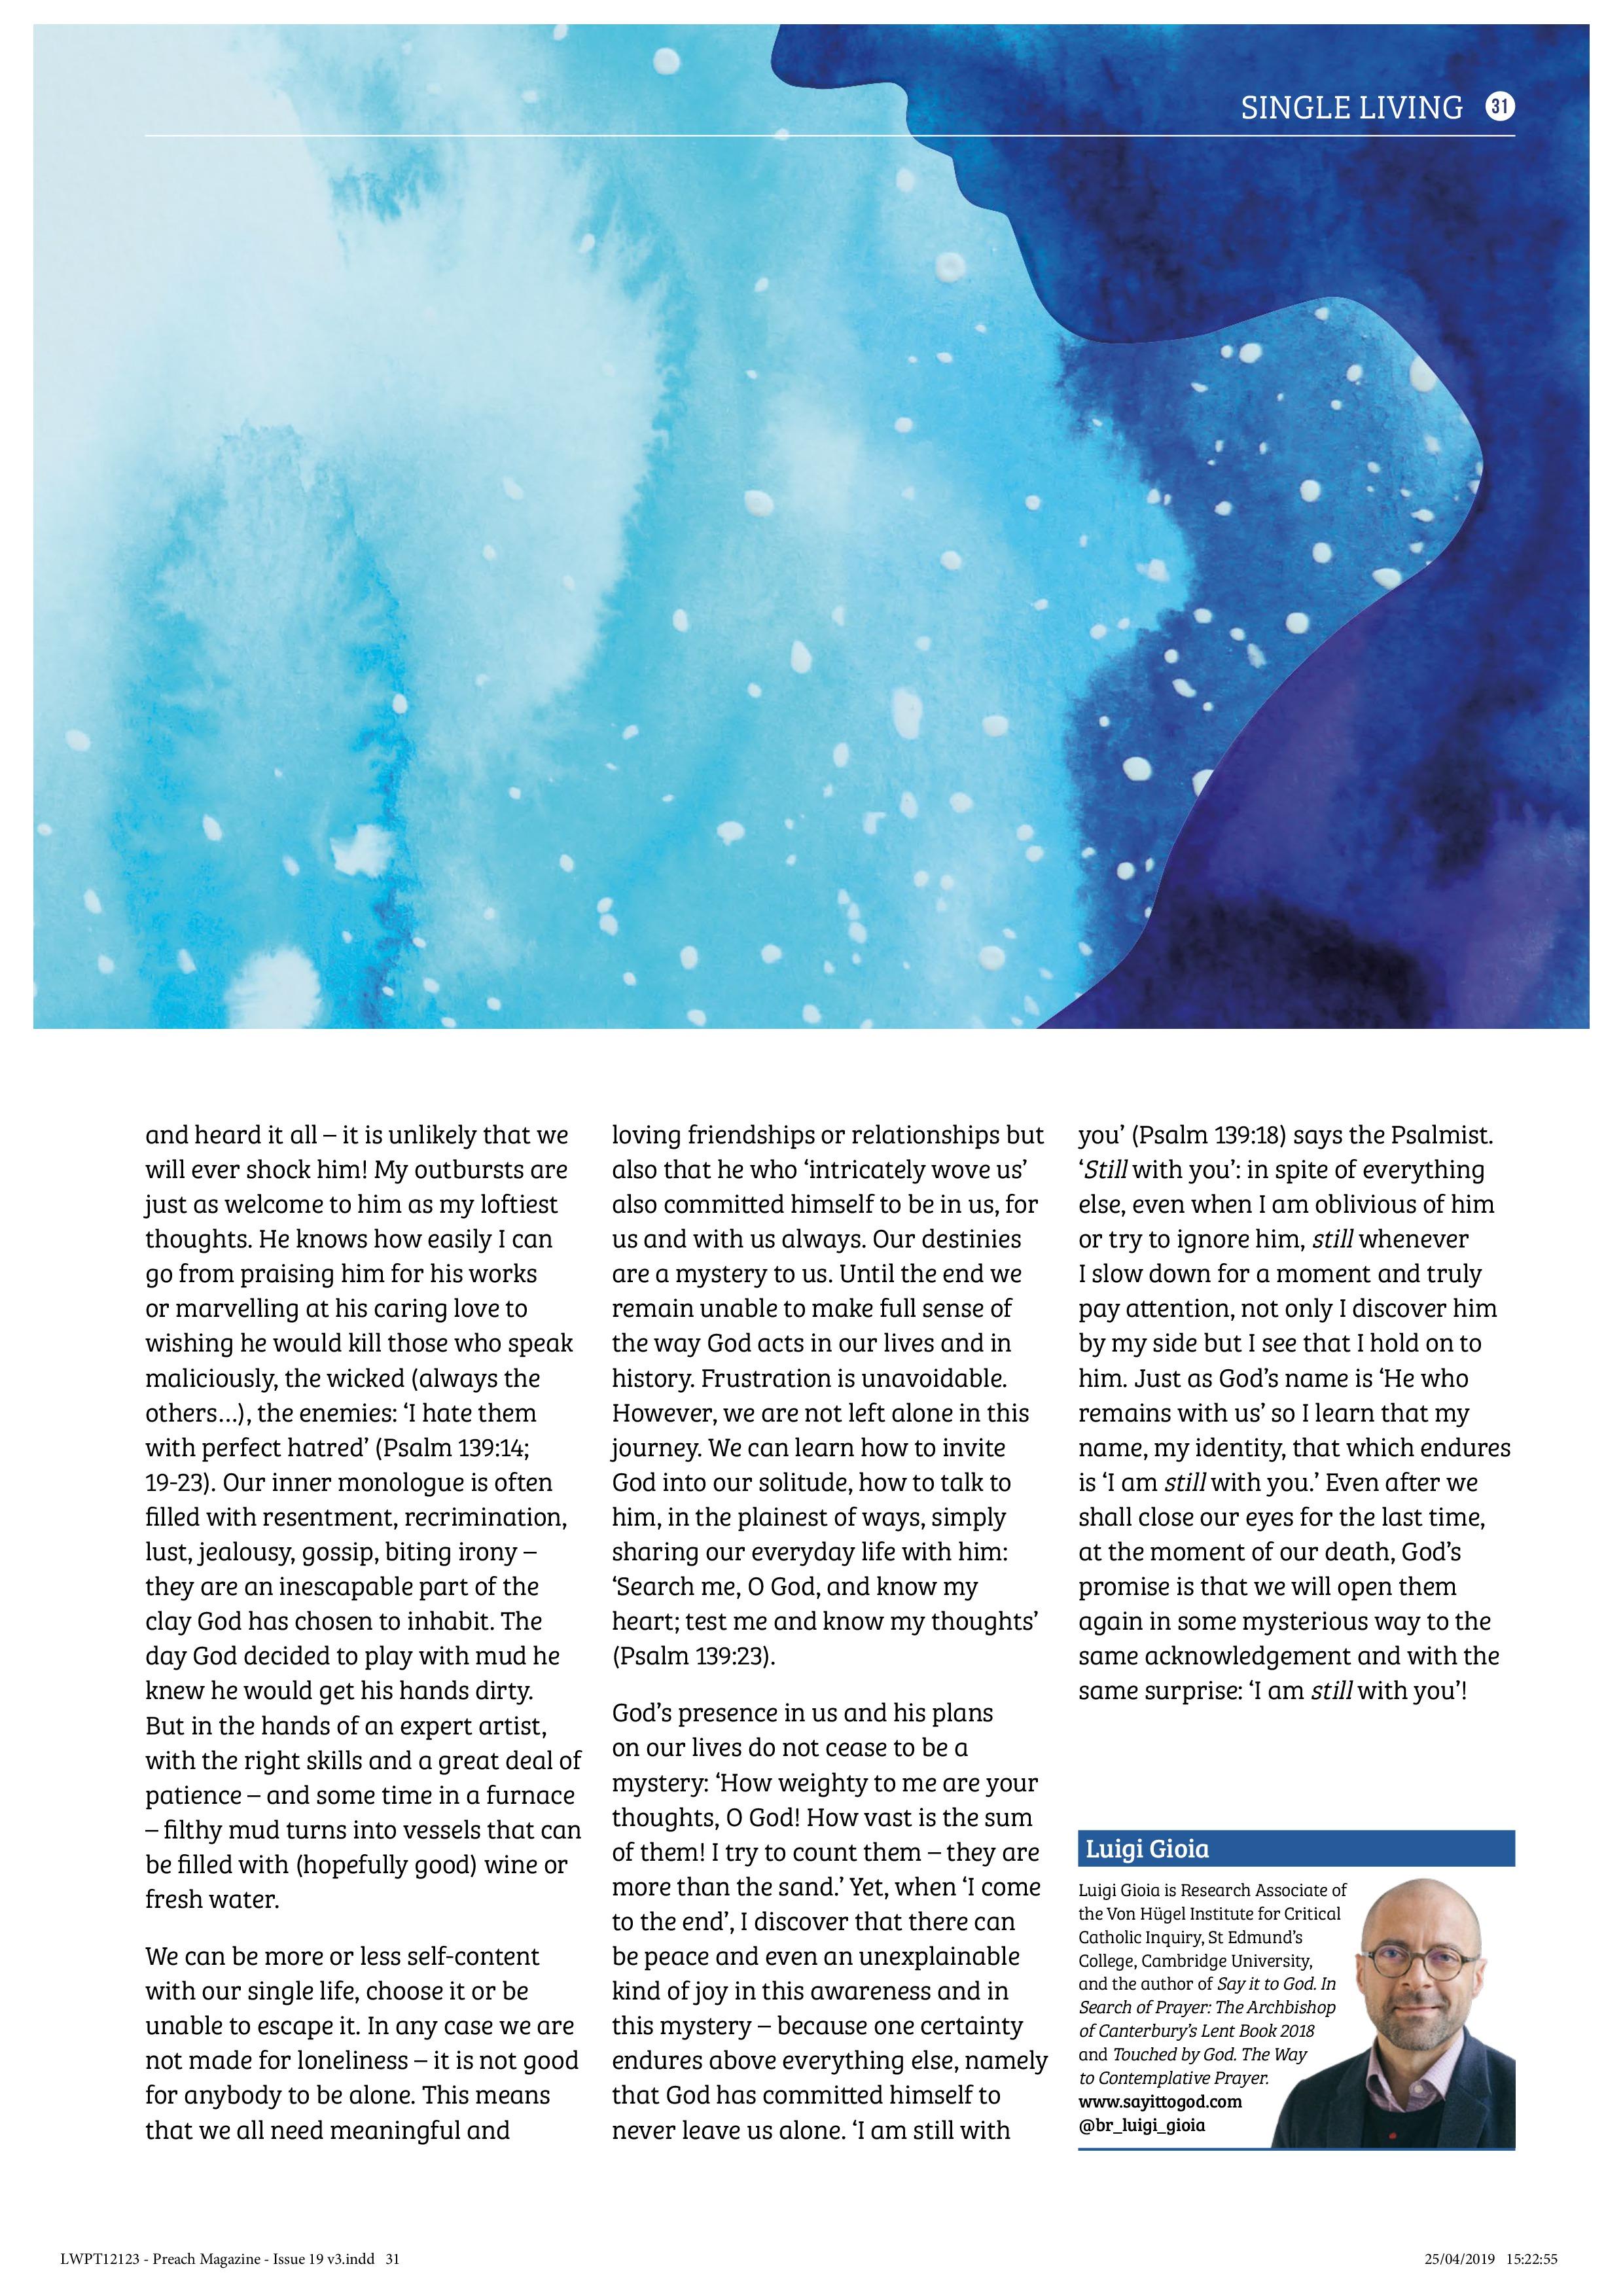 Preach Magazine - Issue 19 - Luigi Gioia-page-5.jpg